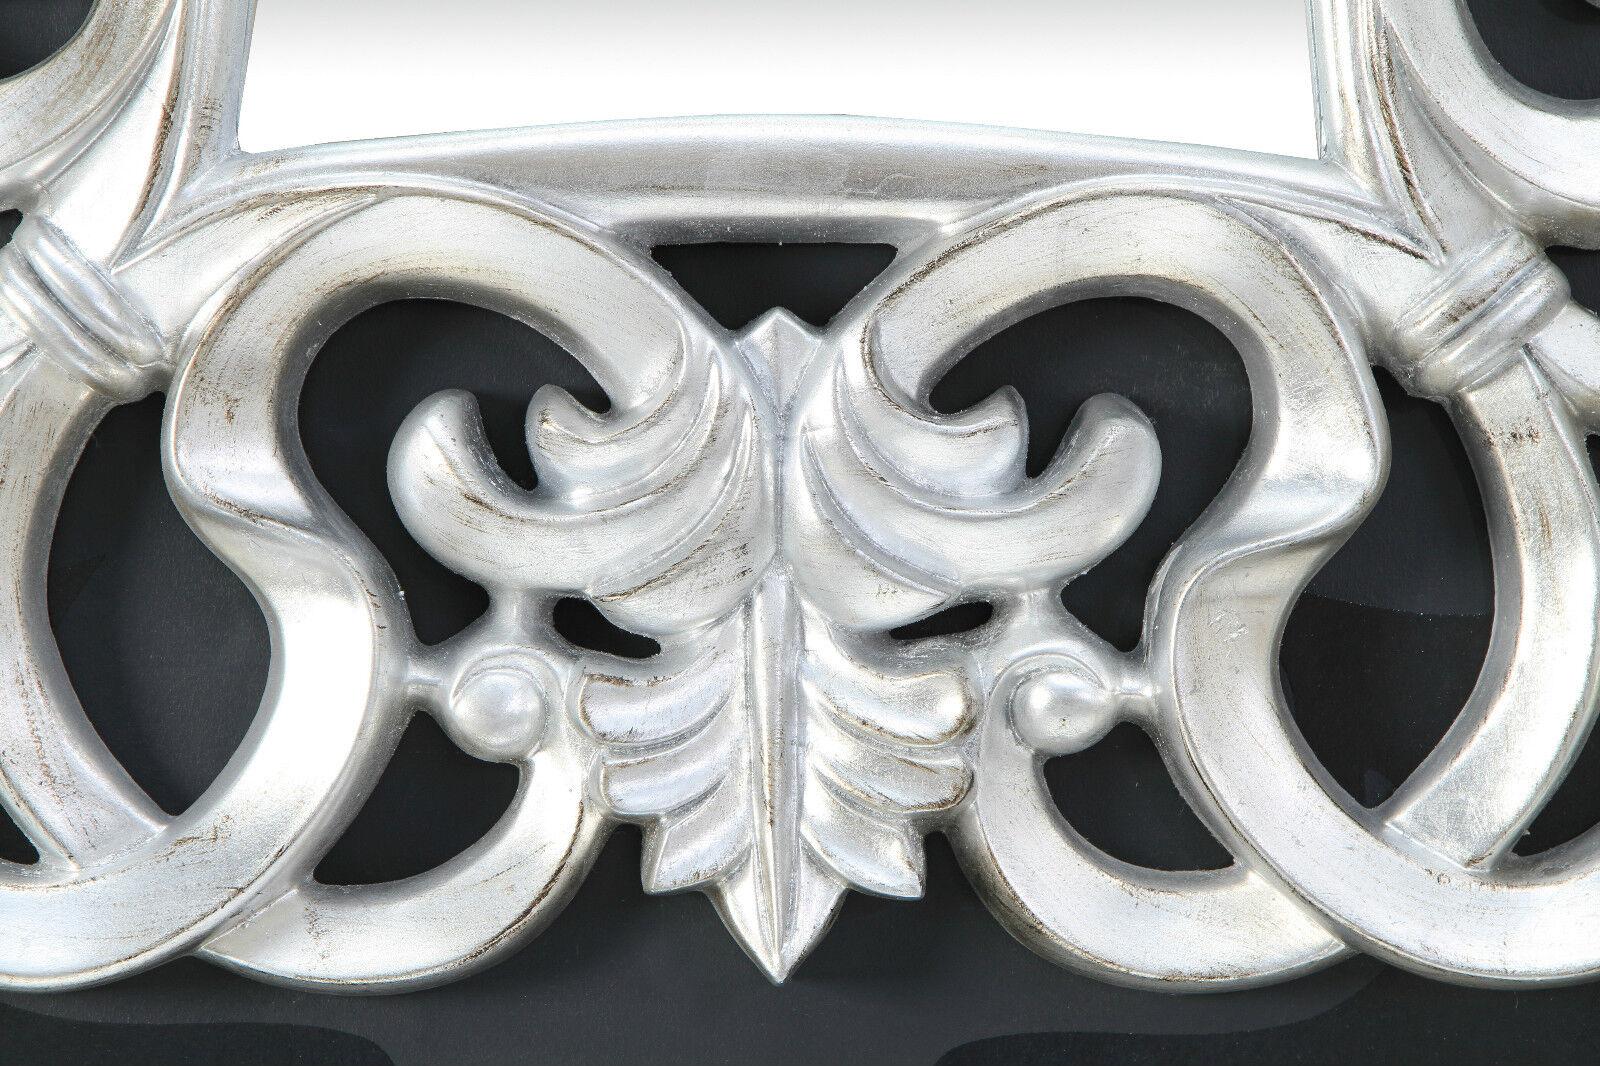 spiegel konsole set antik silber luxuri s prunkvoll barock rokoko specchiera eur 389 90. Black Bedroom Furniture Sets. Home Design Ideas